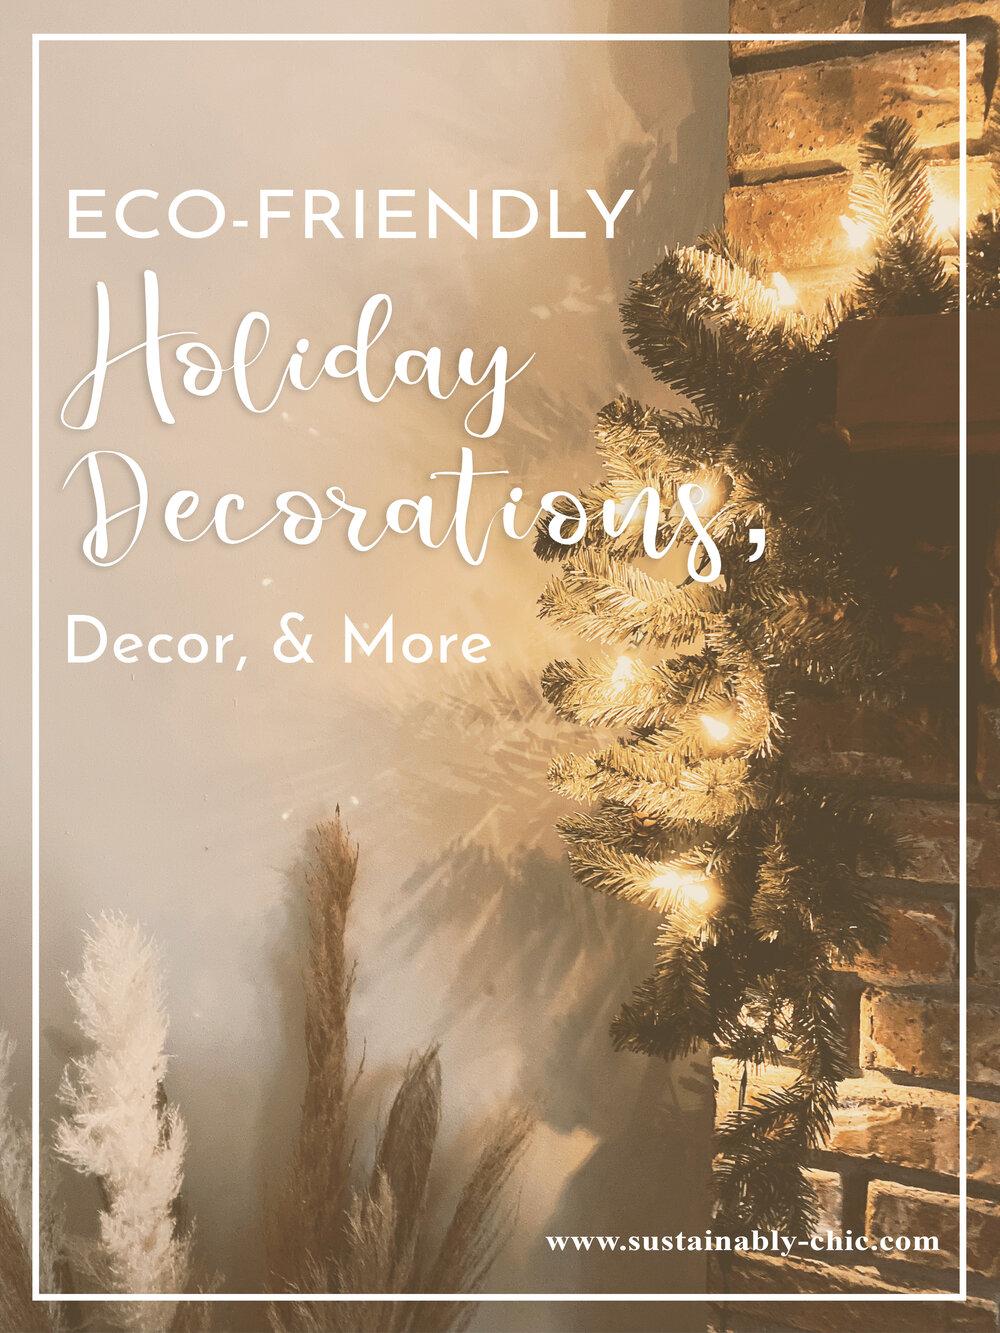 eco-friendly-holiday-decorations.jpg